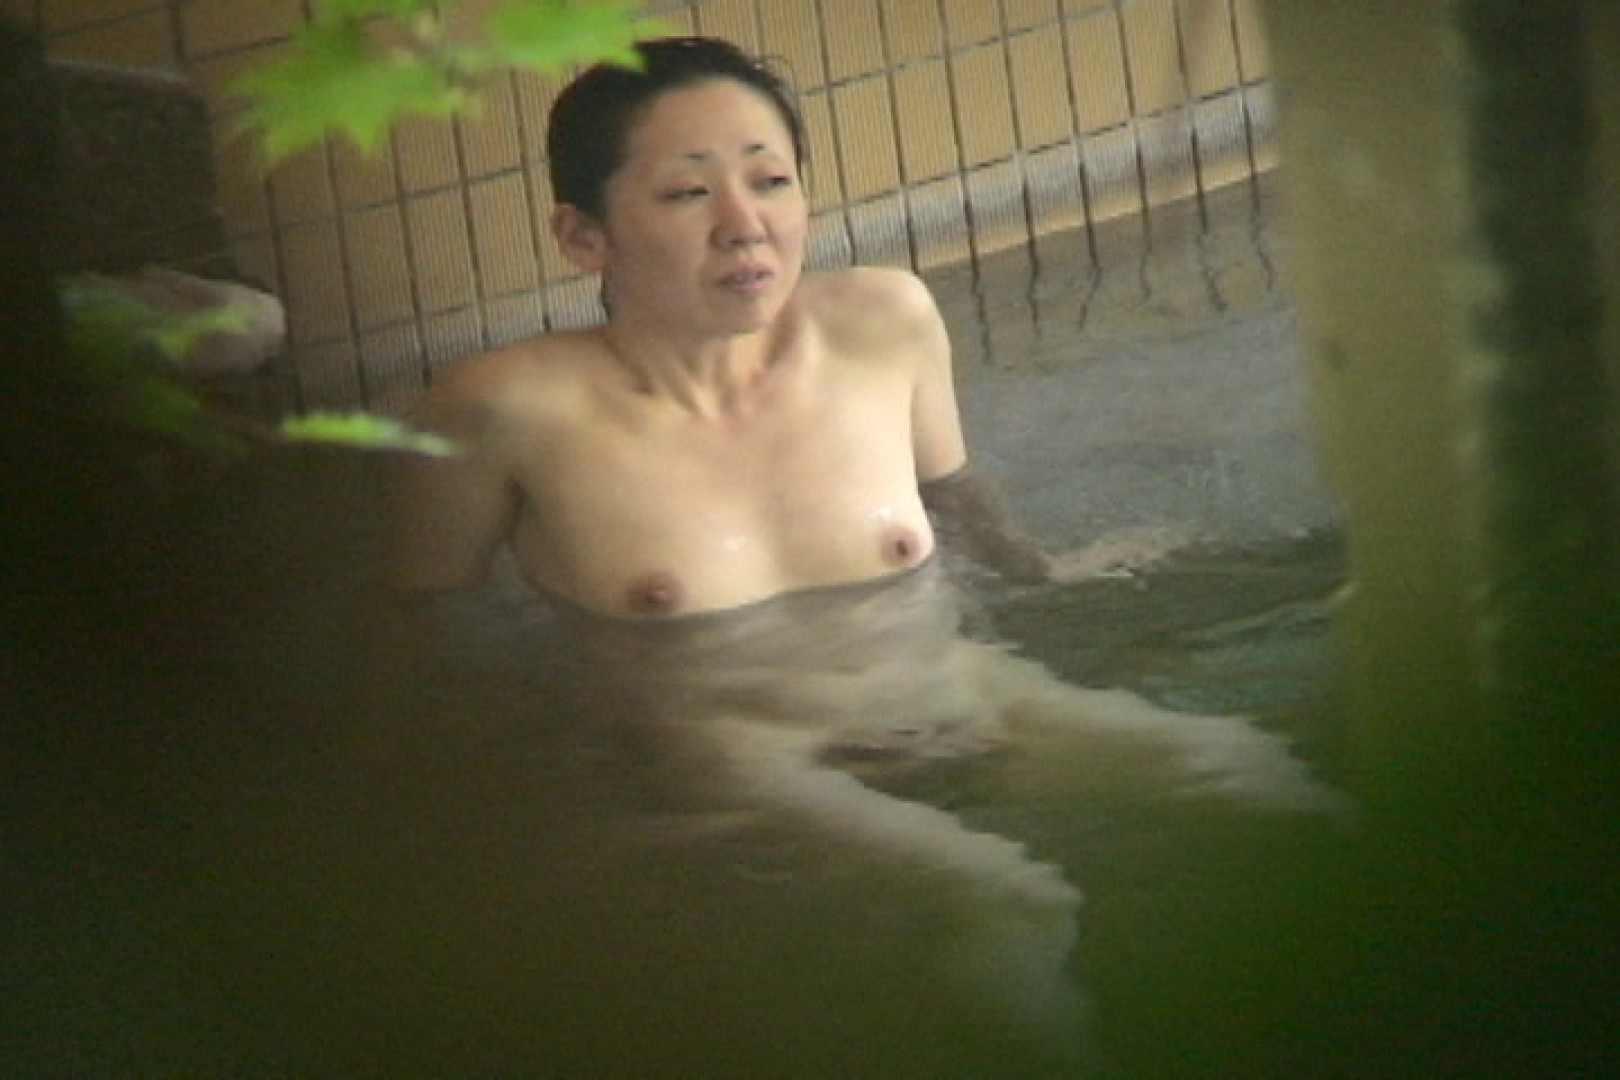 Aquaな露天風呂Vol.449 エッチな盗撮  93pic 12